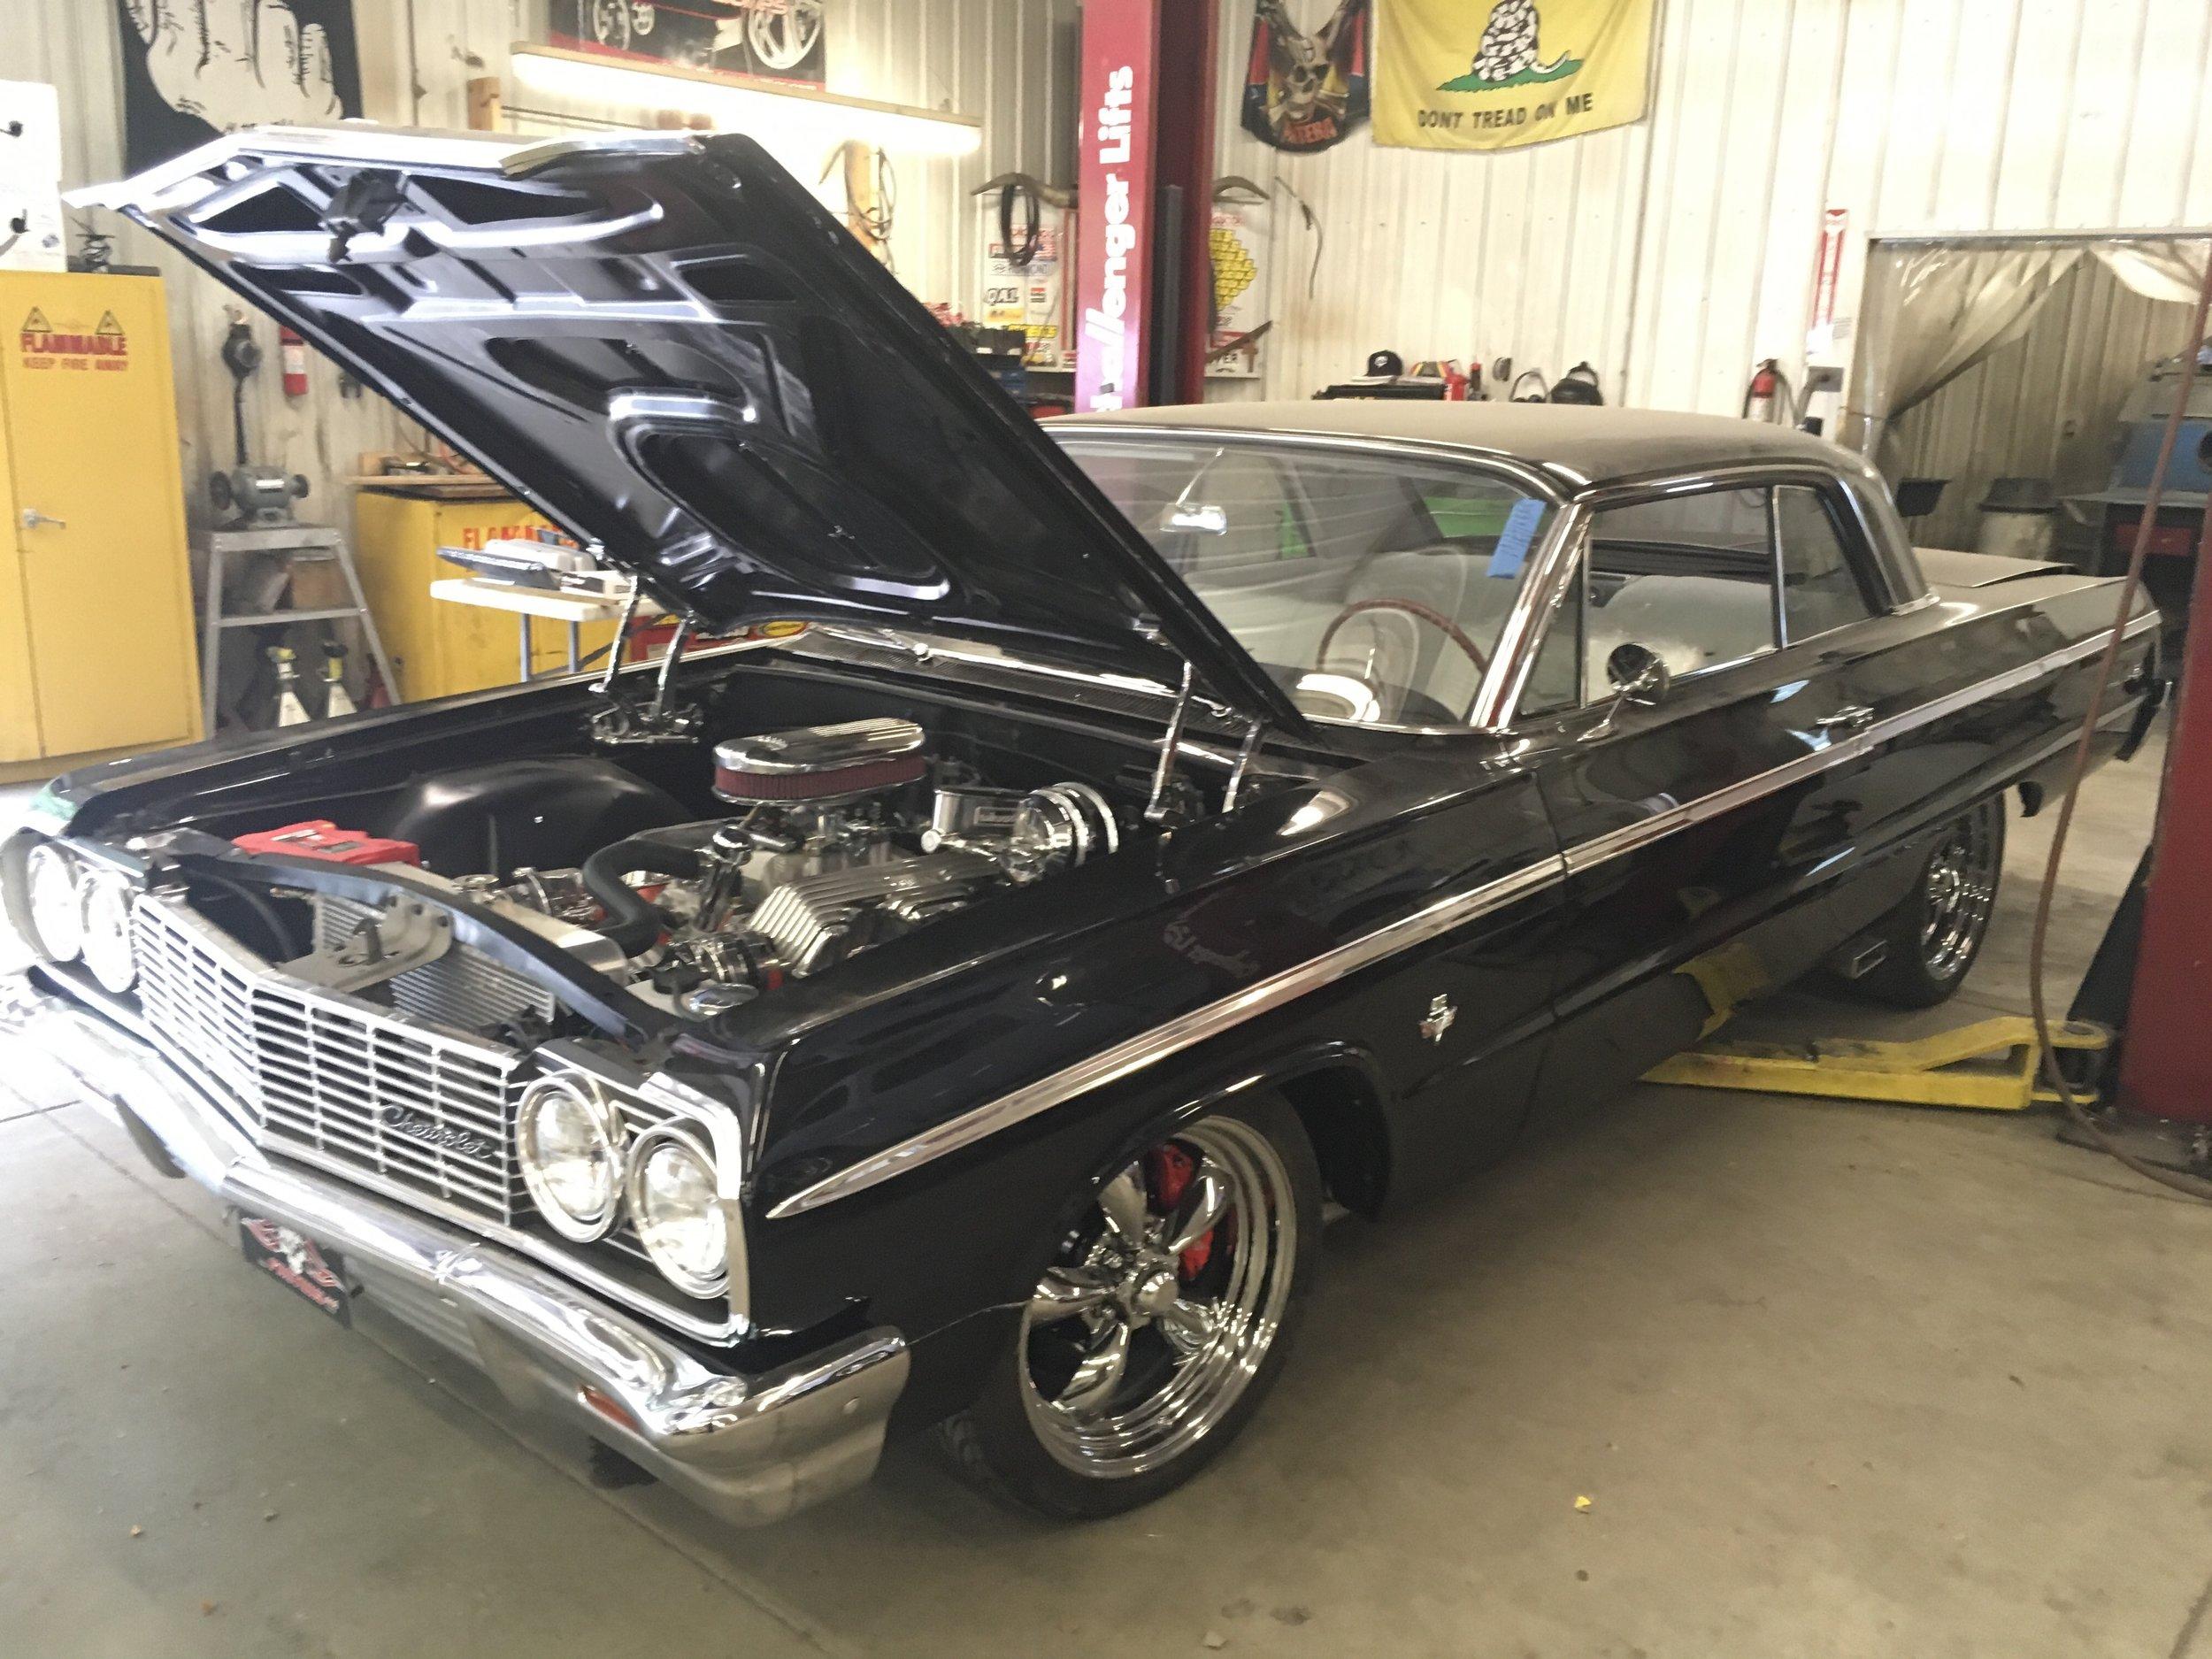 1964-Impala-SS-minneapolis-hot-rod-custom-built-restorations.jpg